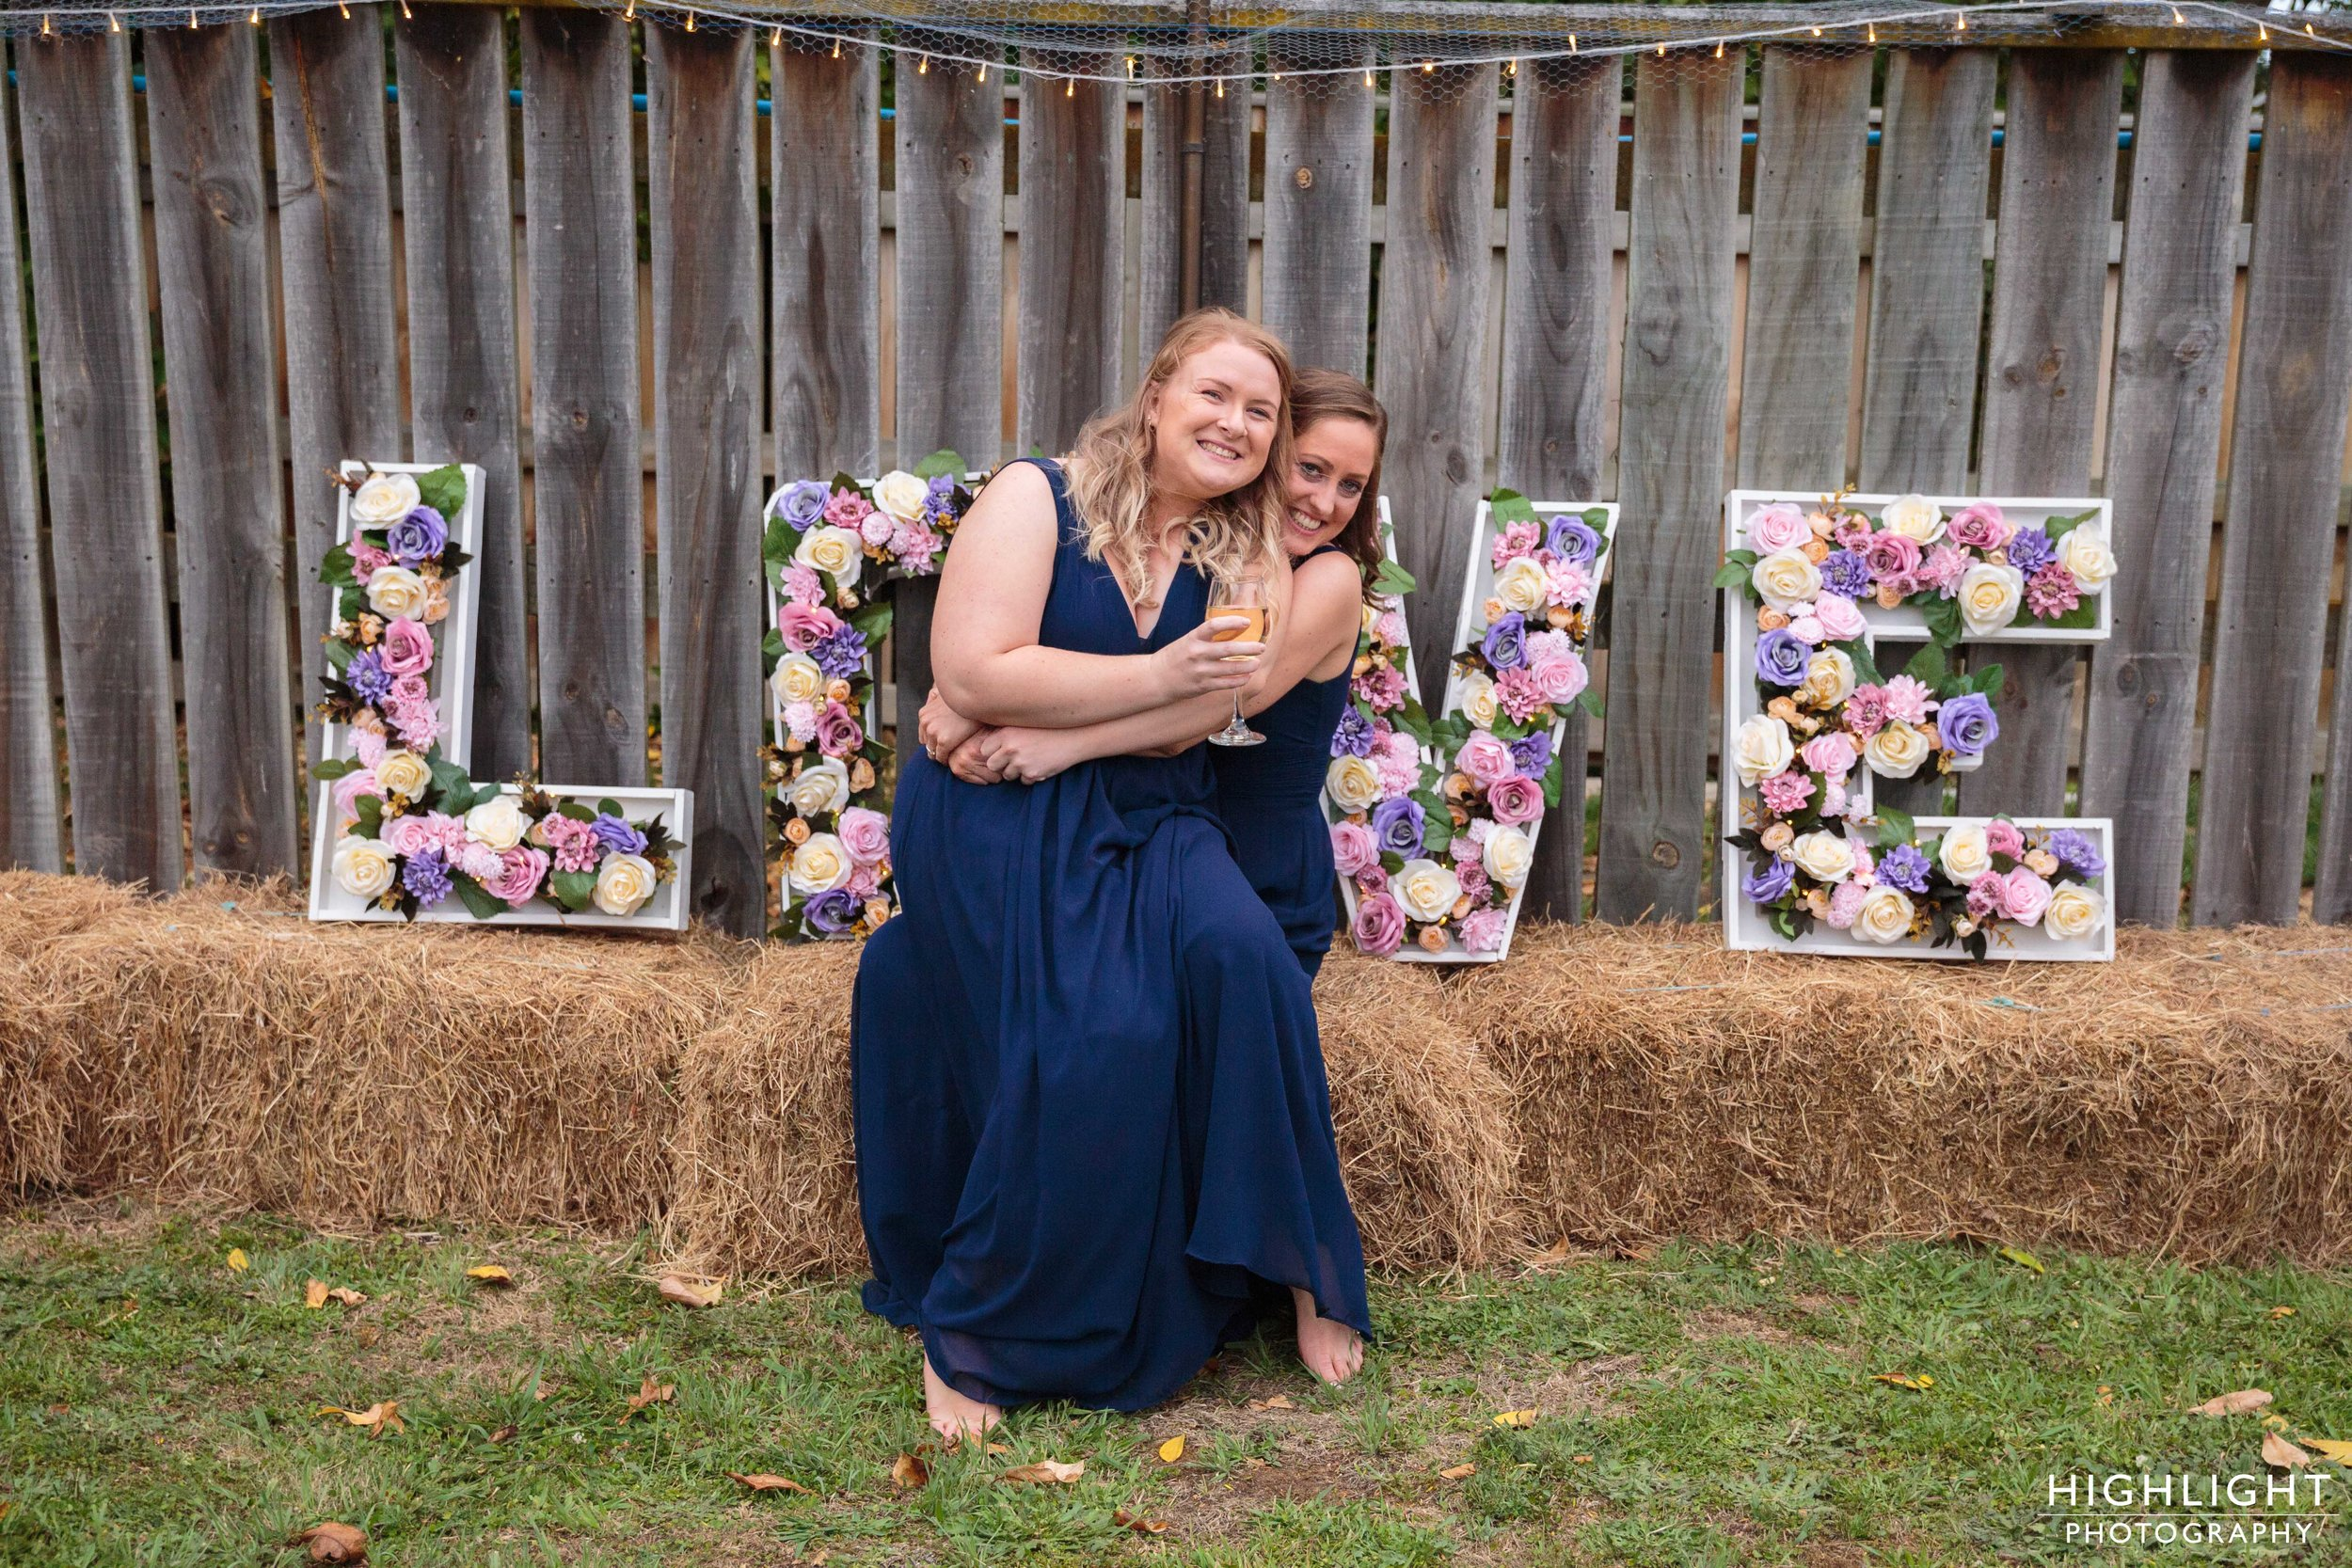 JM-2017-Highlight-wedding-photography-palmerston-north-new-zealand-233.jpg